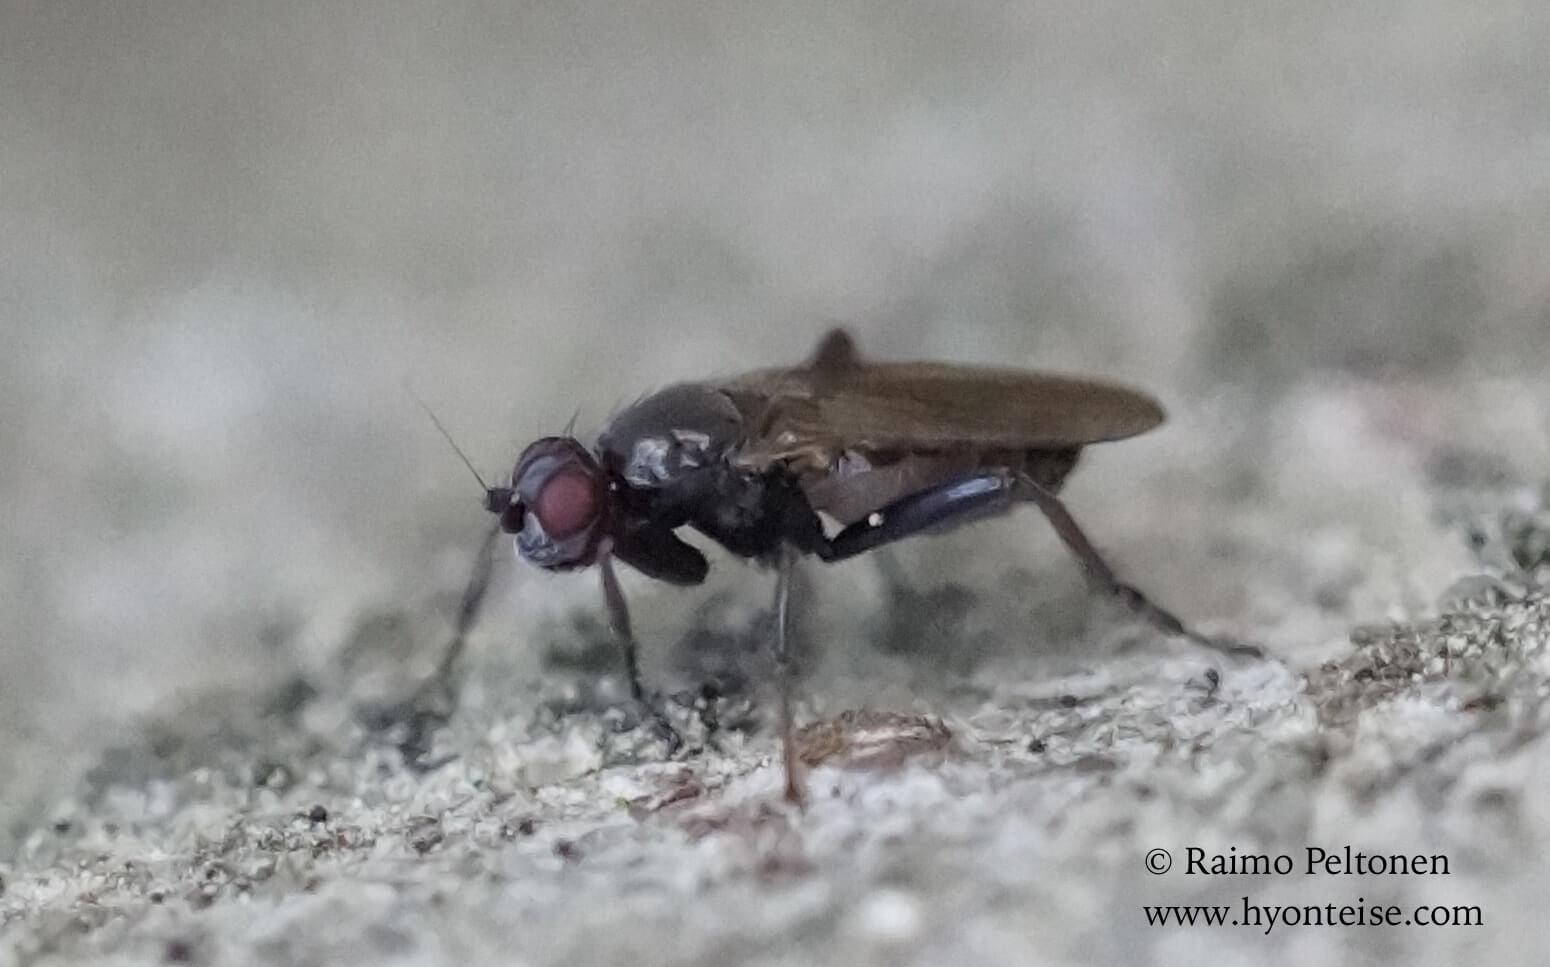 cf. Copromyza sp. (det. Paul Beuk)